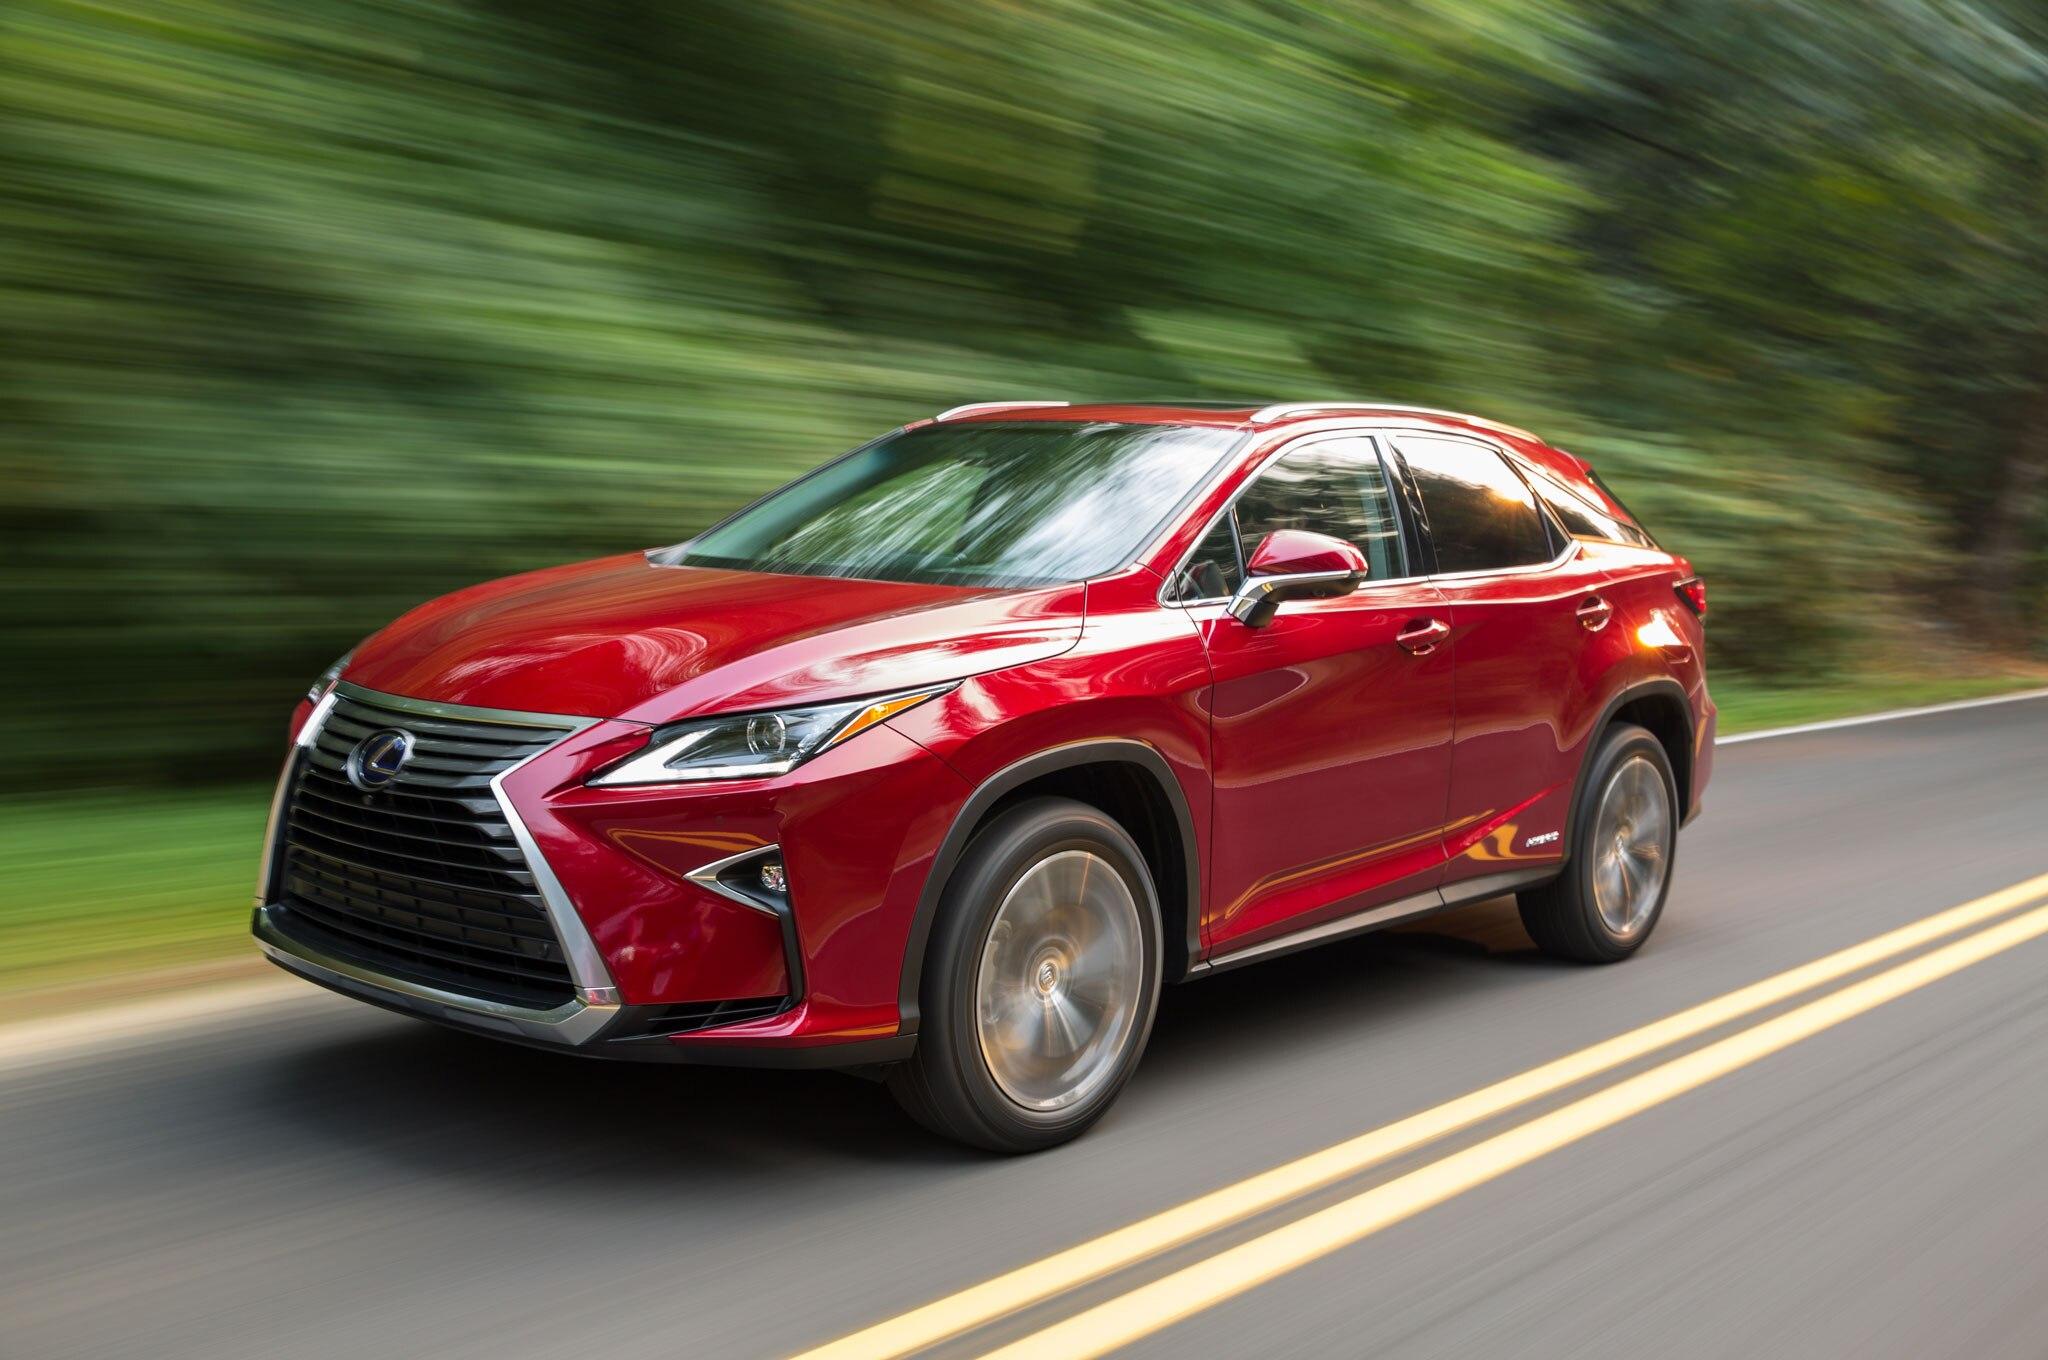 http://st.automobilemag.com/uploads/sites/11/2015/09/2016-Lexus-RX-450h-Hybrid-front-three-quarter-in-motion-05.jpg